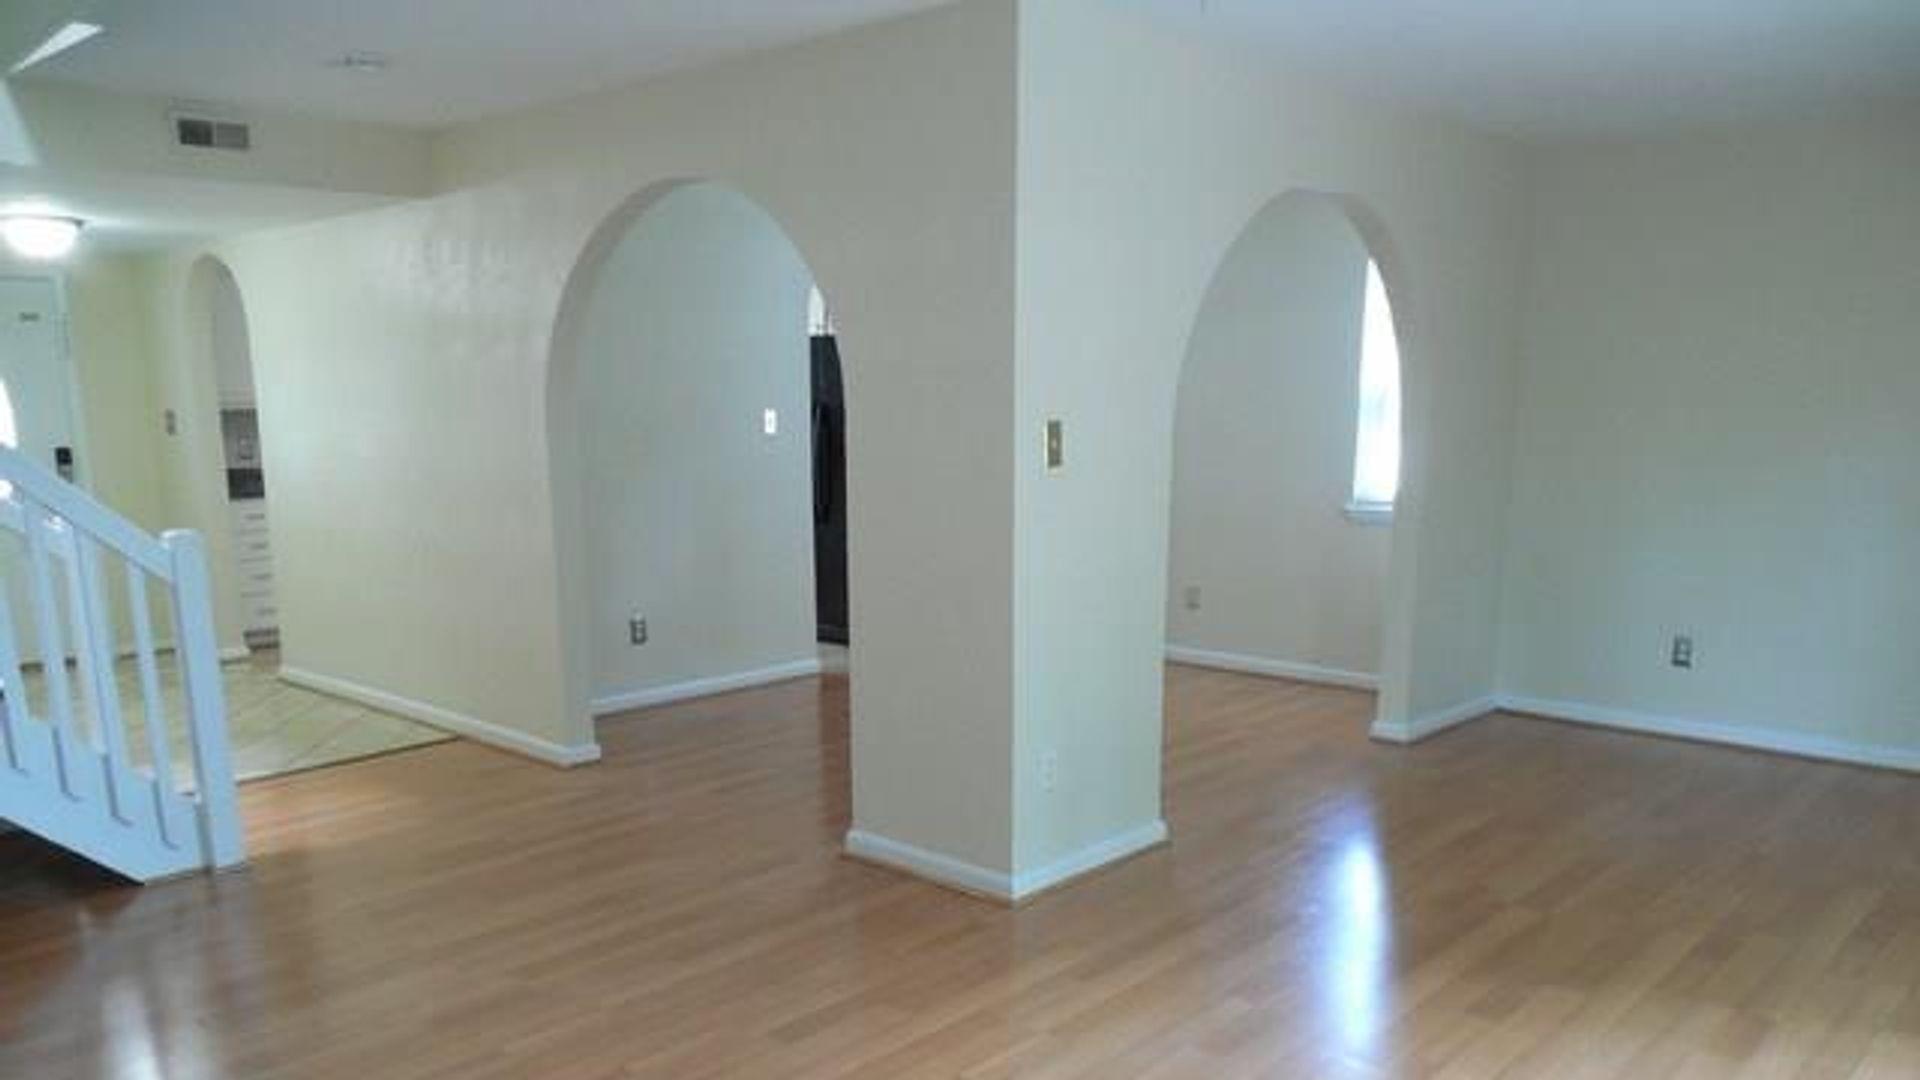 4 Bed Apartment At Barrington Drive Virginia Beach